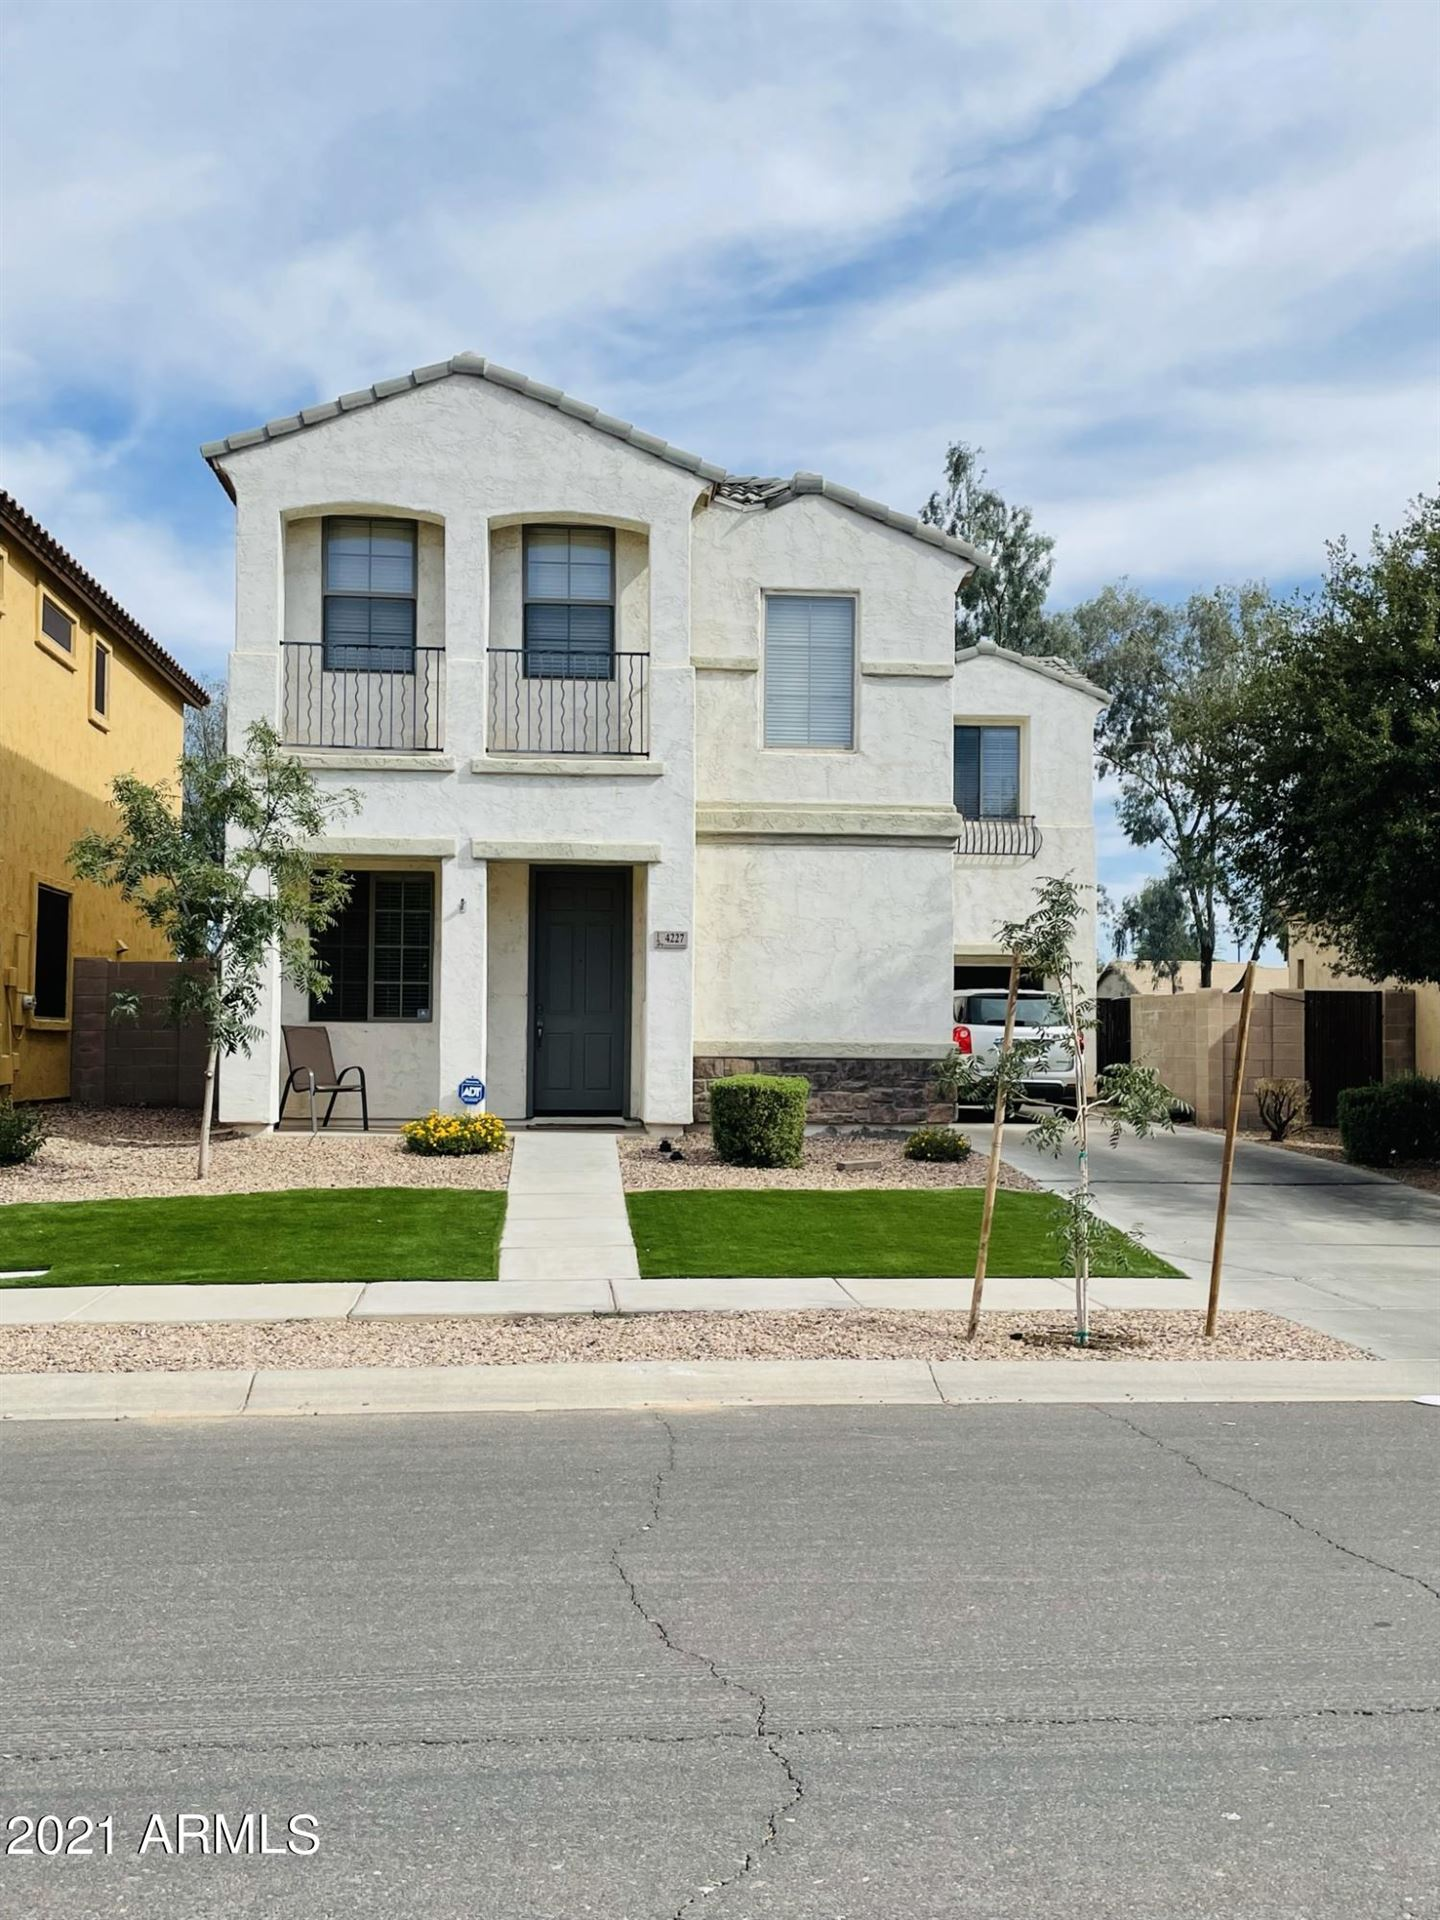 Photo of 4227 E SANTA FE Lane, Gilbert, AZ 85297 (MLS # 6249435)